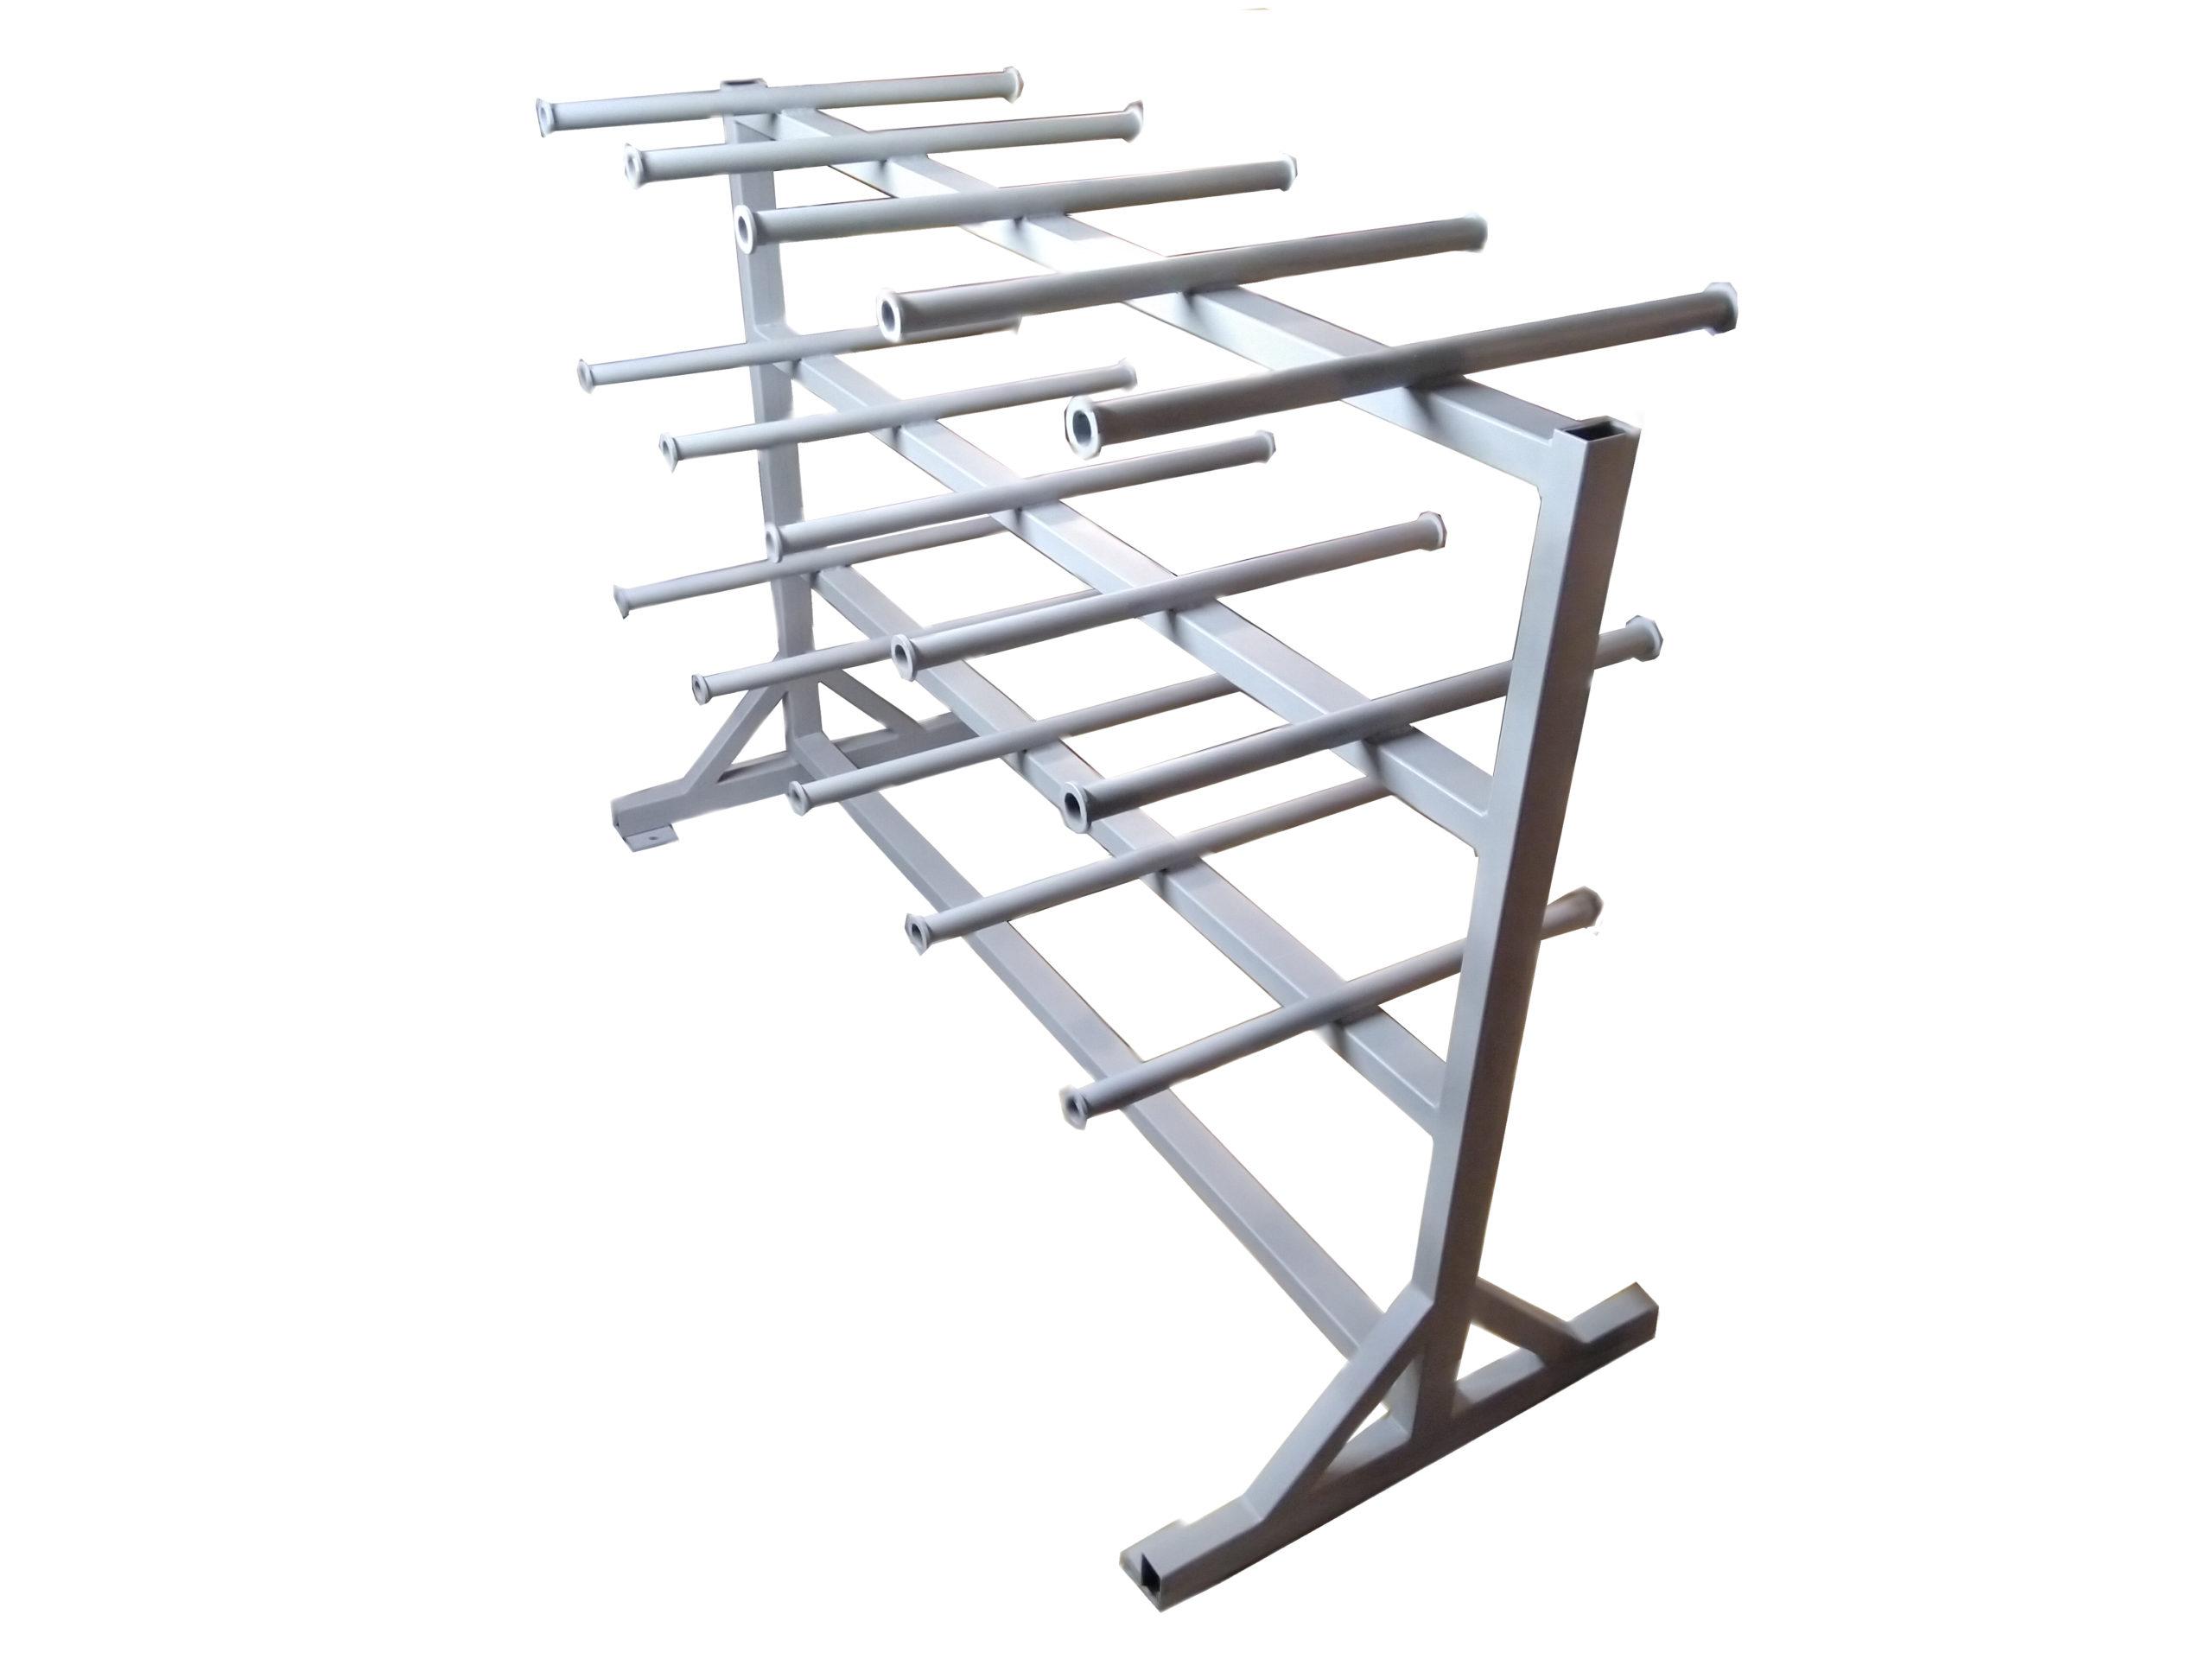 Regał wieszak konstrukcja spawanie welding construction hanger prodiction hanger